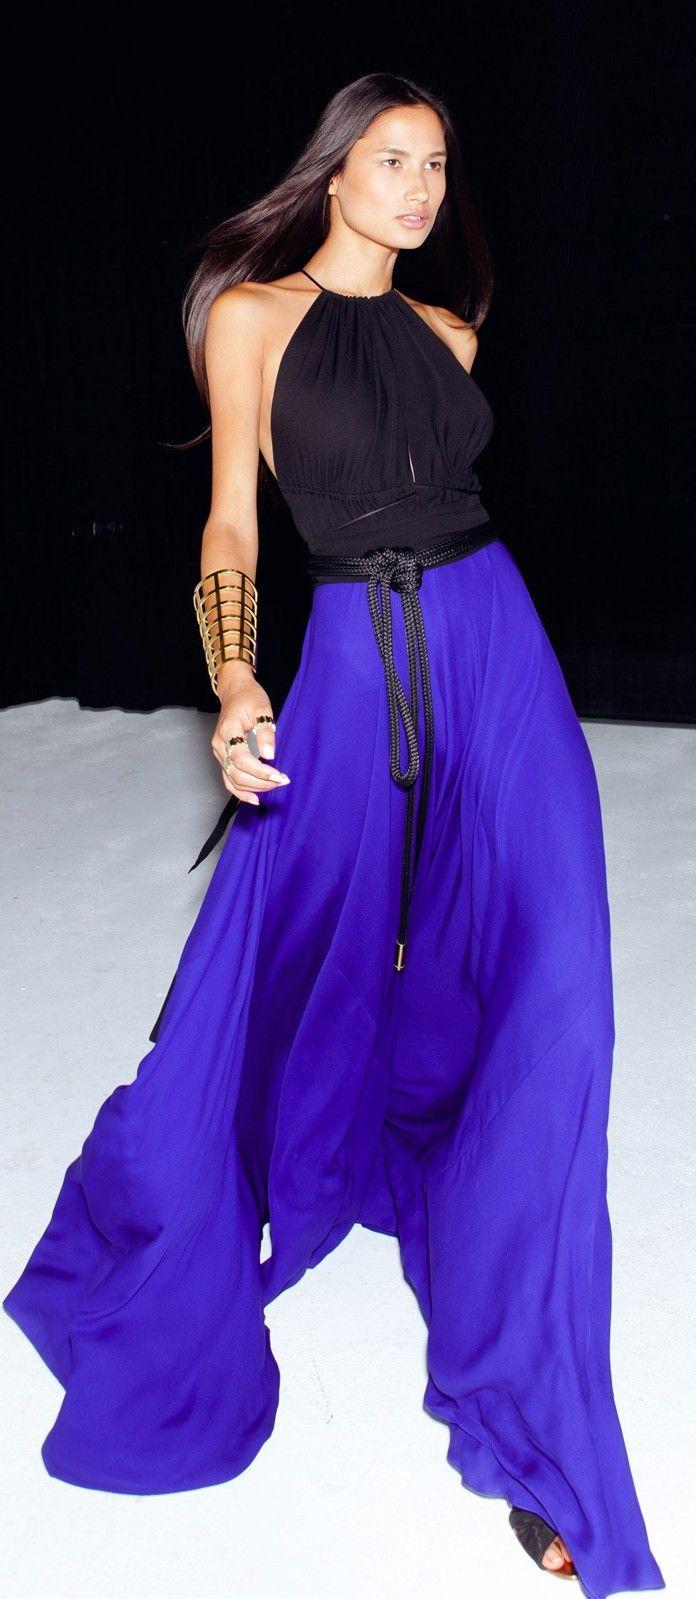 Designer fashion | Juan Carlos Obando resort. This looks like it feels so good to wear